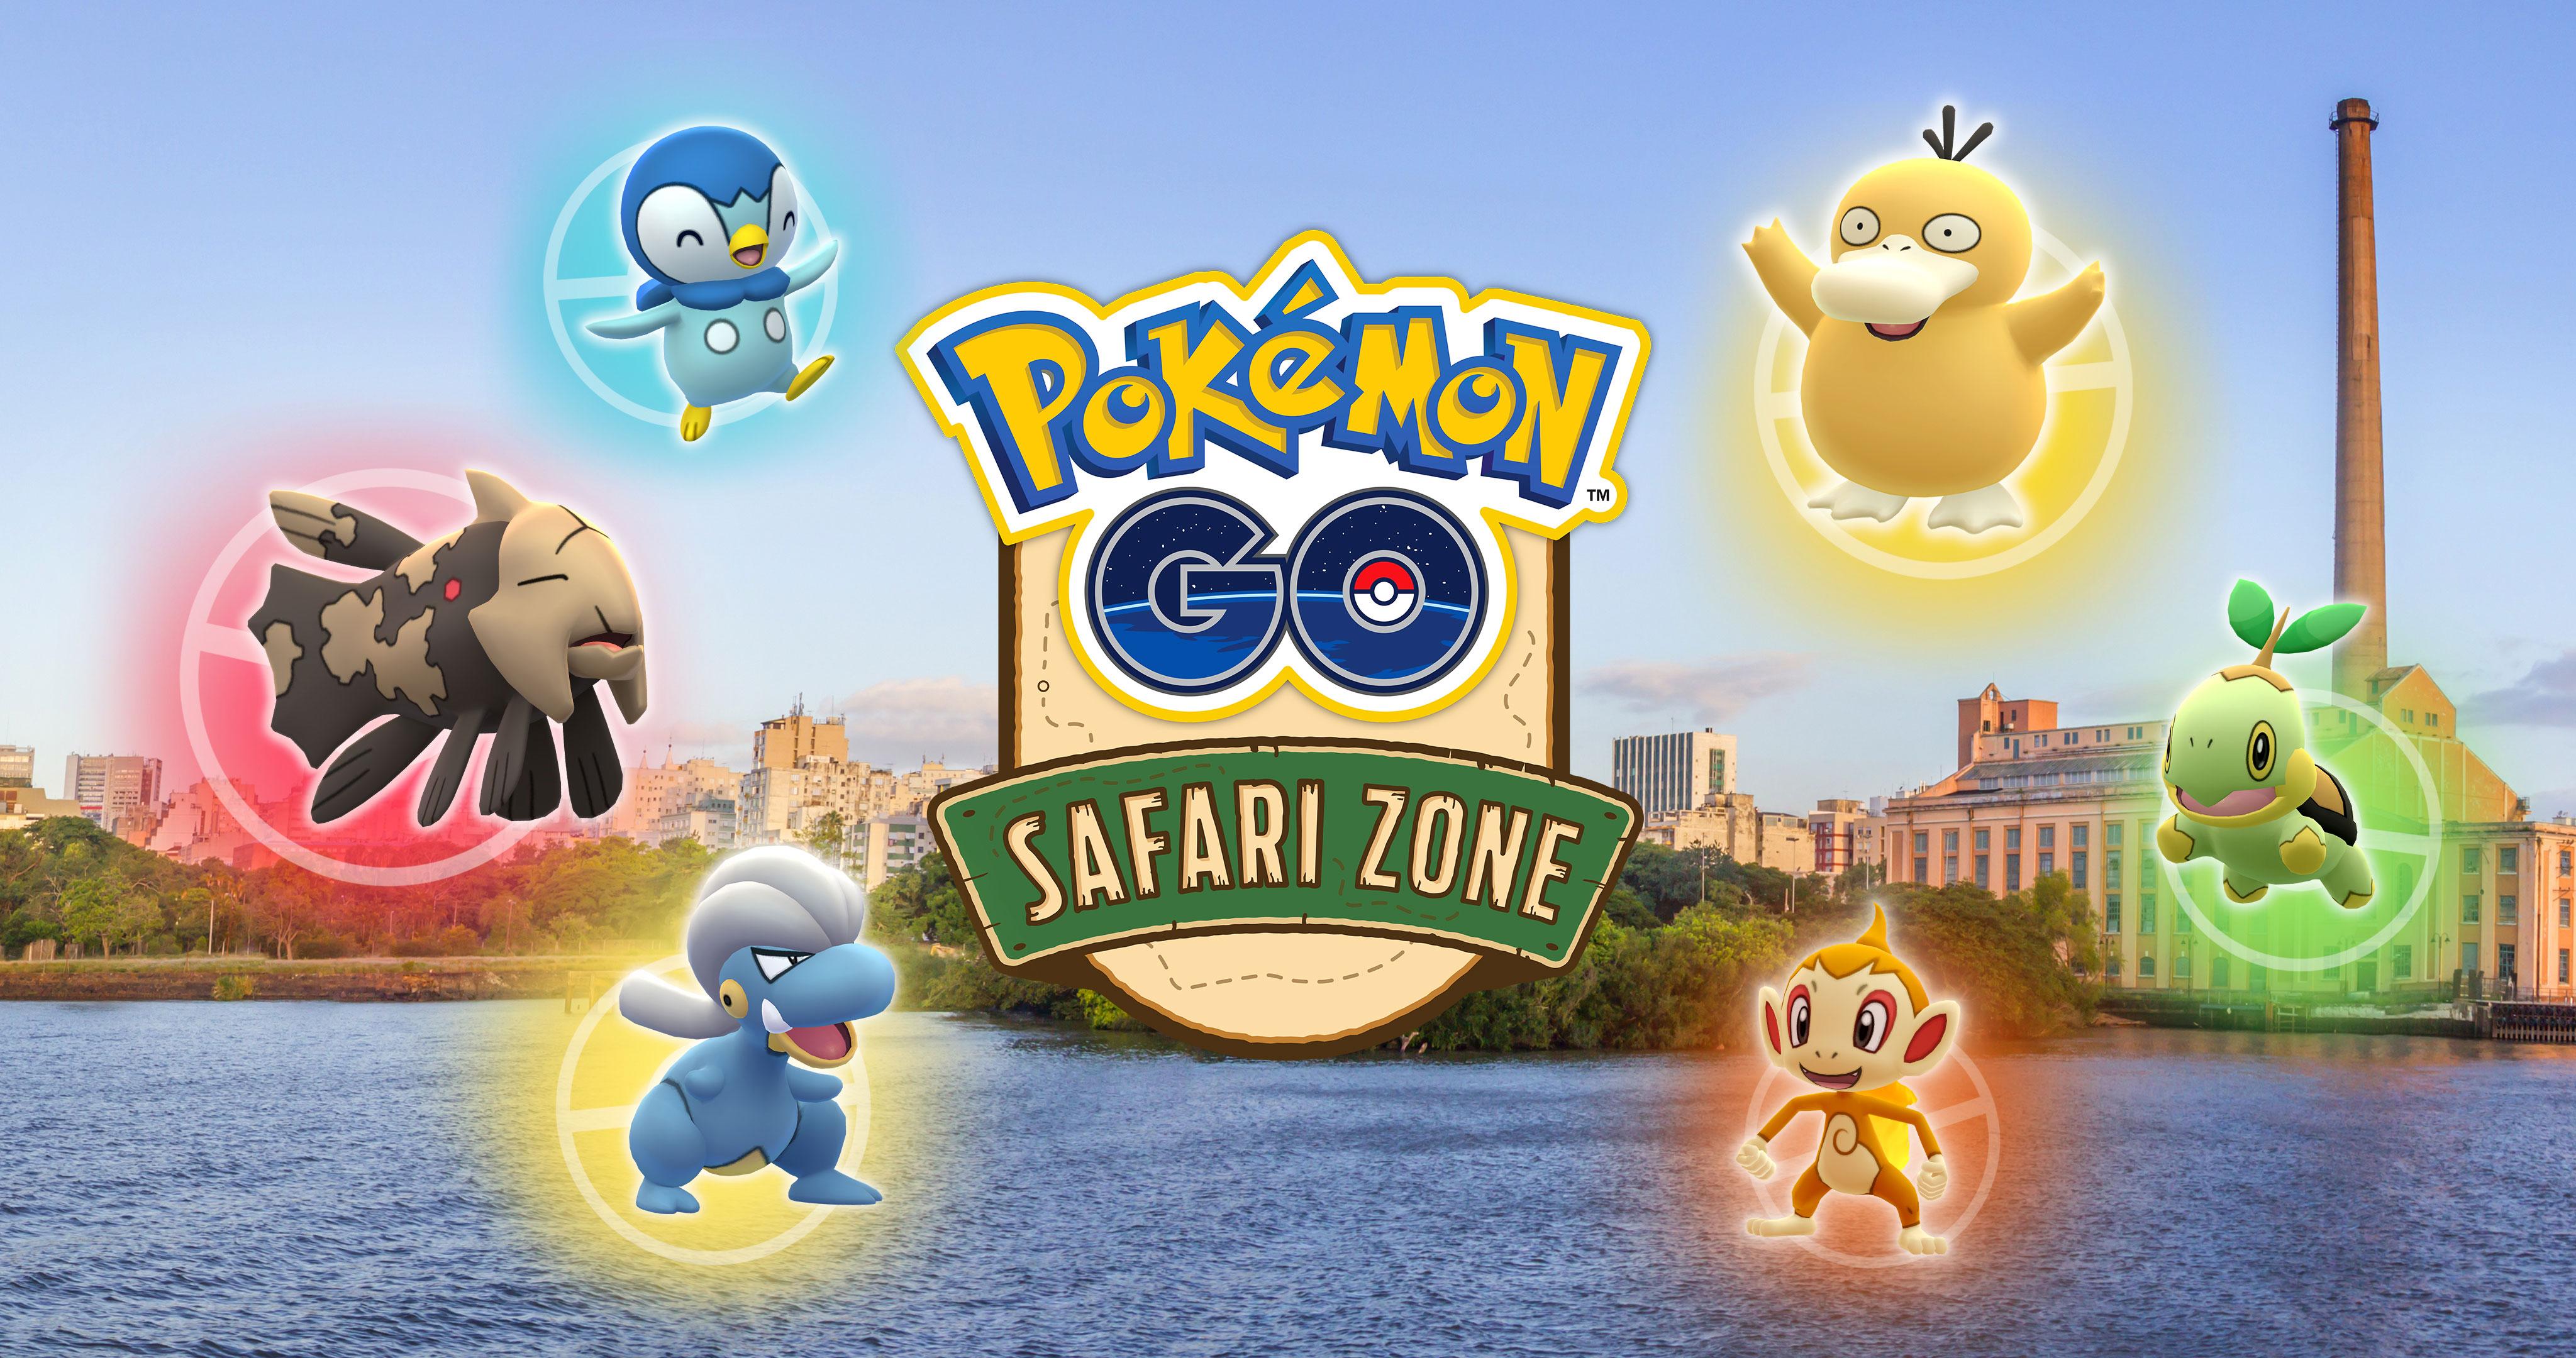 Pokemon GO's Next Safari Zone Will Take Place in Brazil